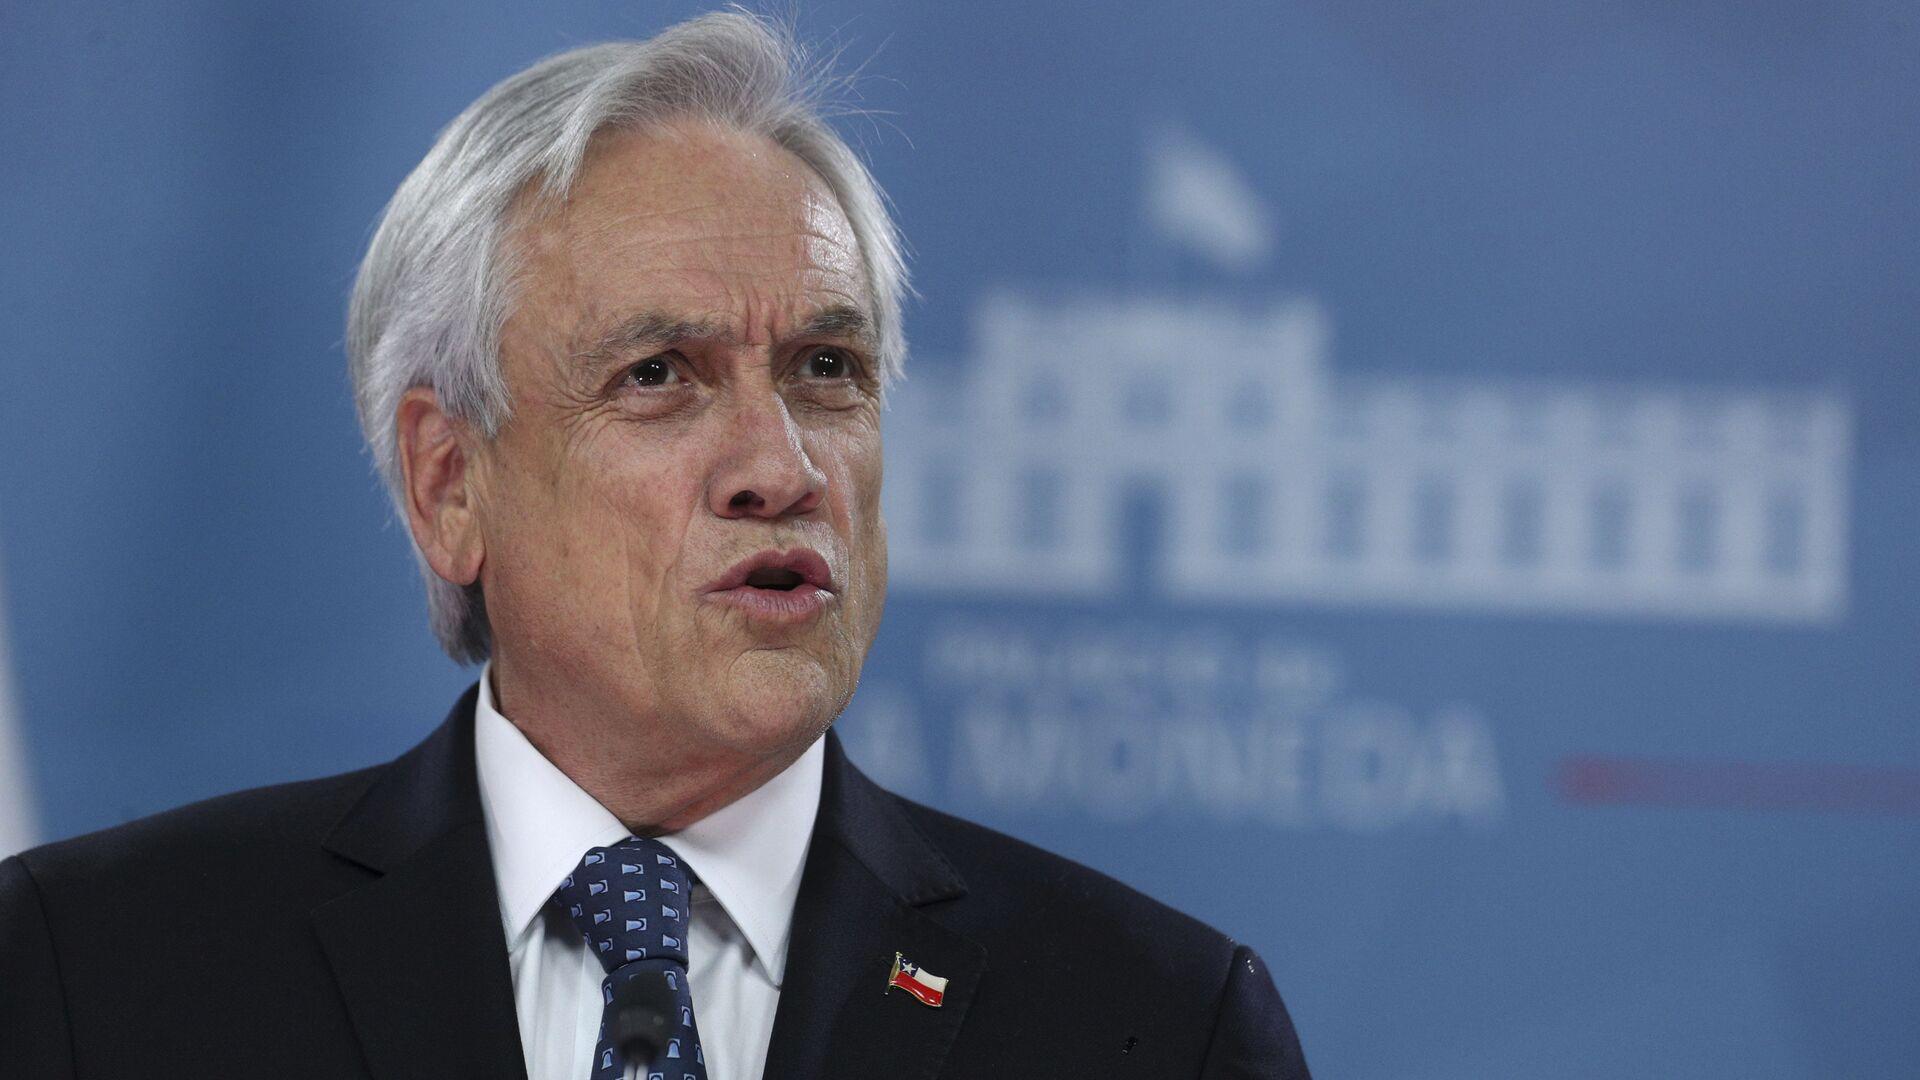 Sebastián Piñera, presidente de Chile - Sputnik Mundo, 1920, 17.08.2021